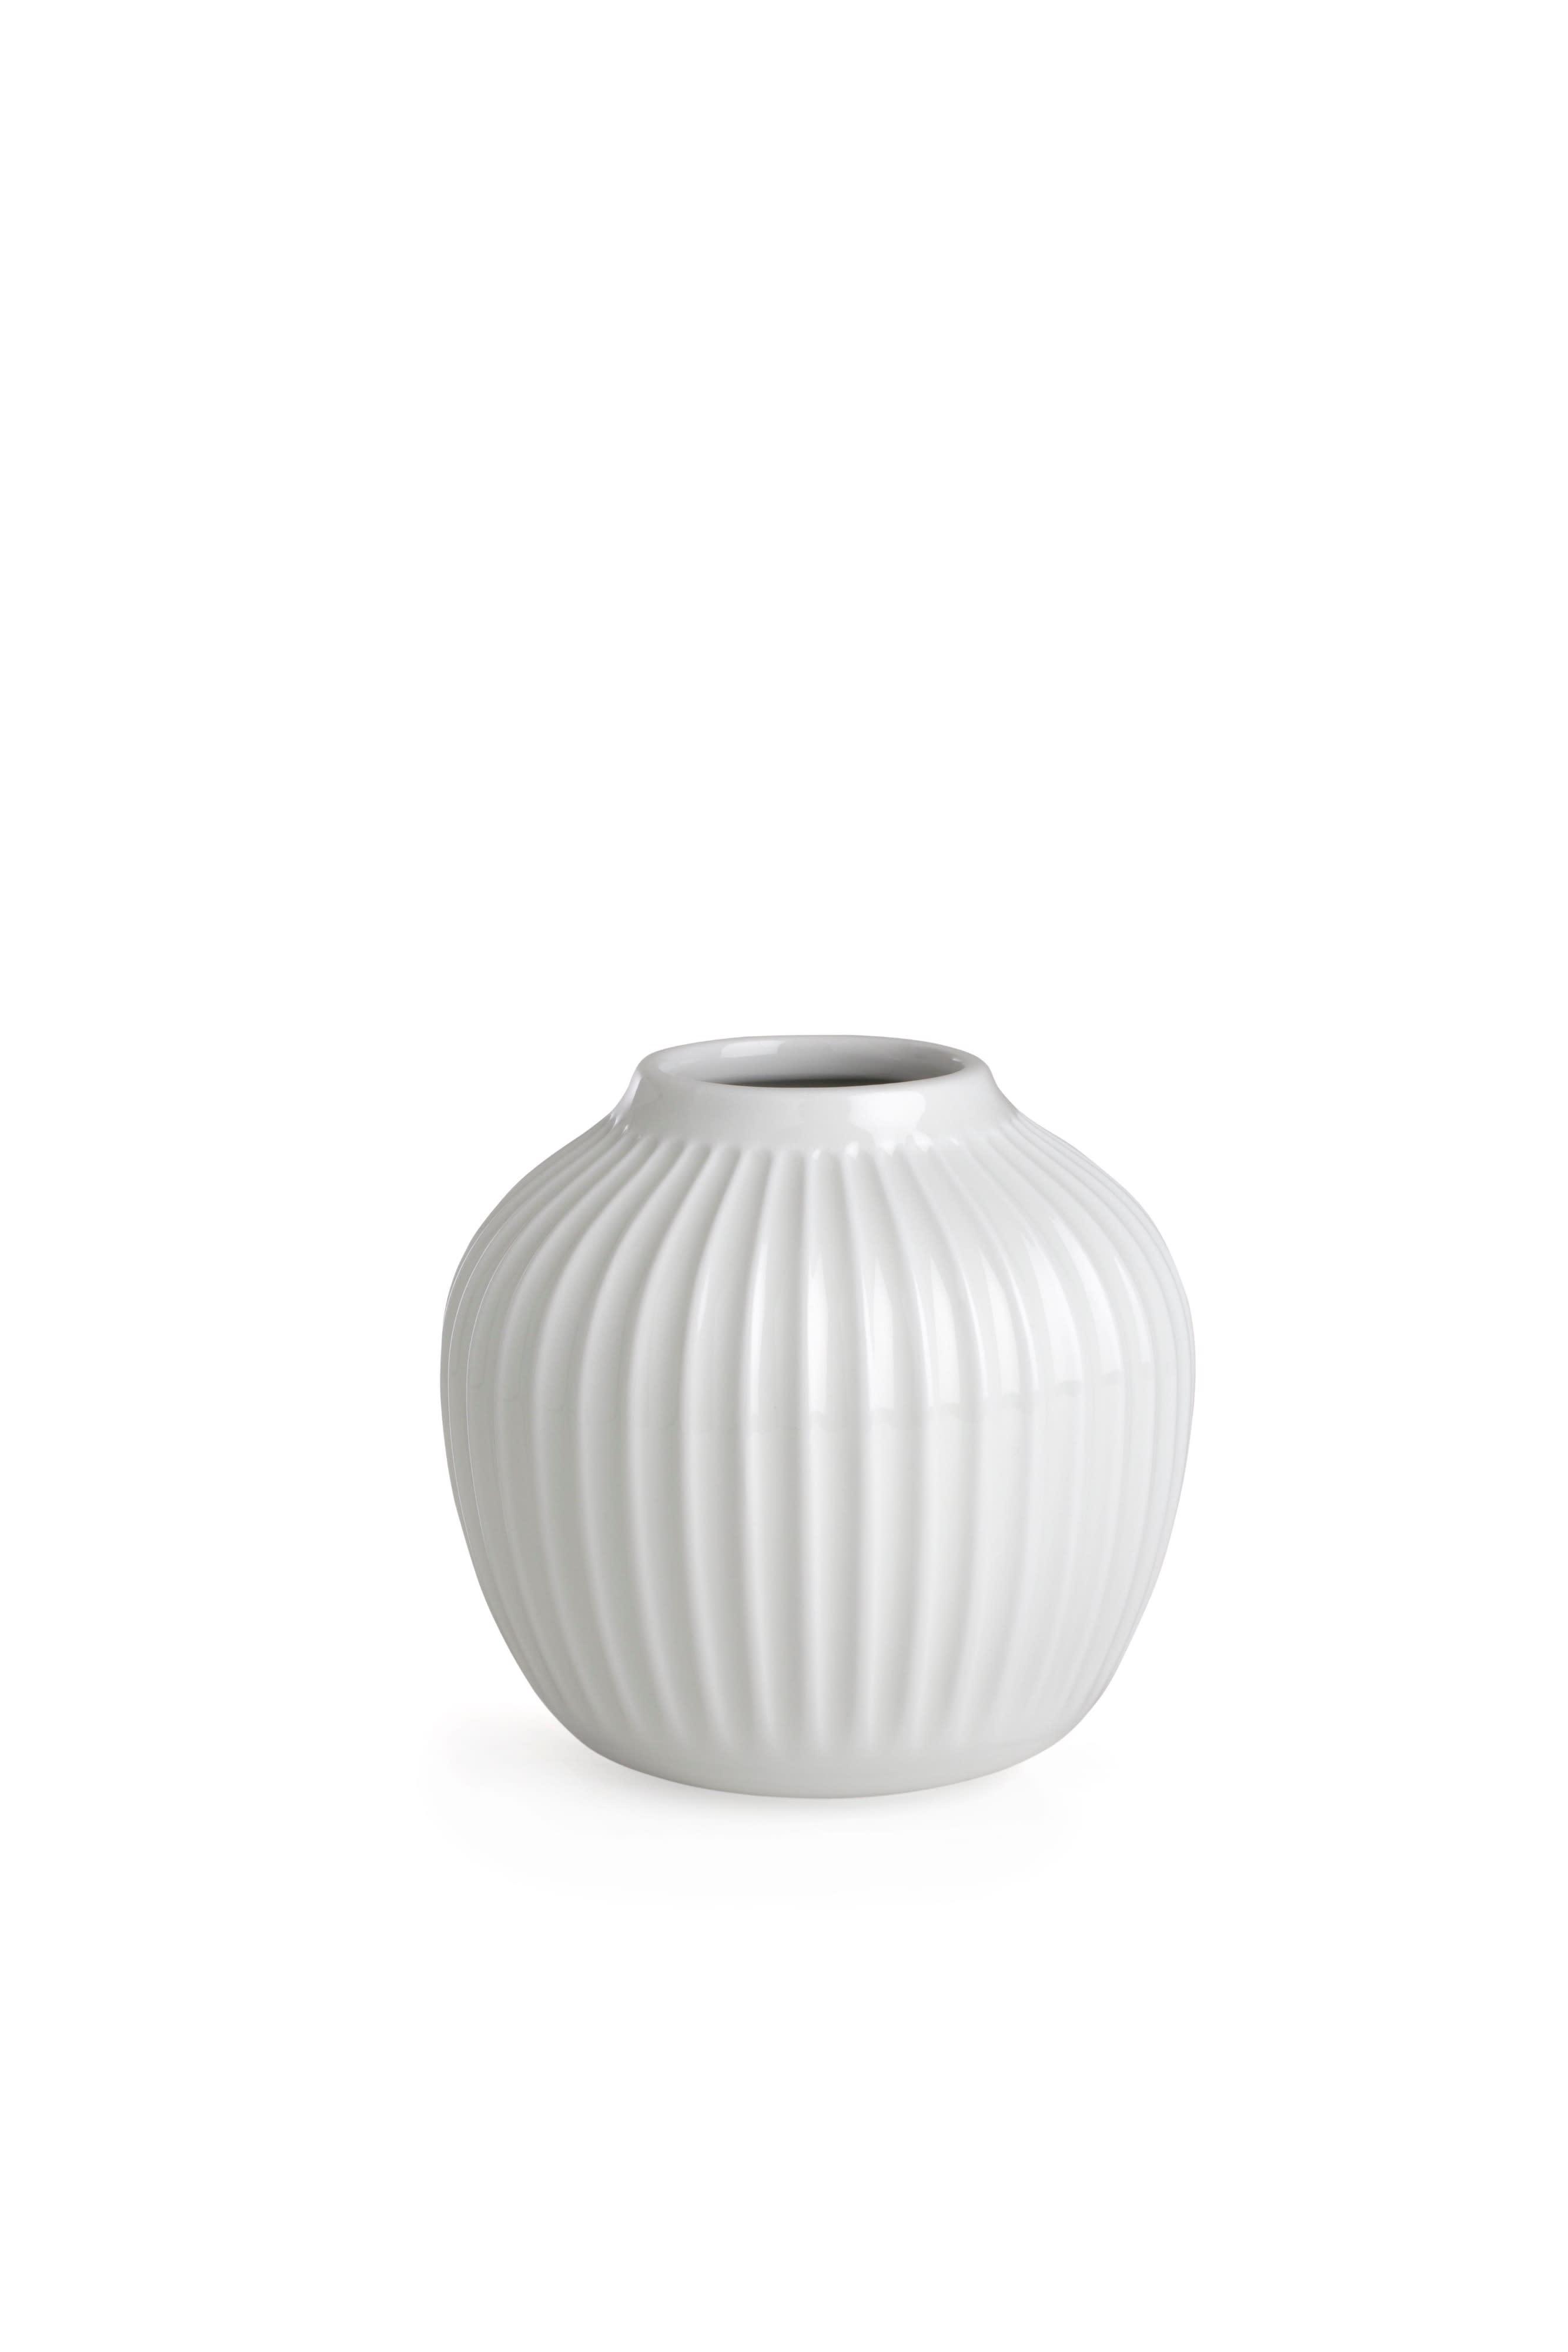 Kähler Design White Hammershøj Vase